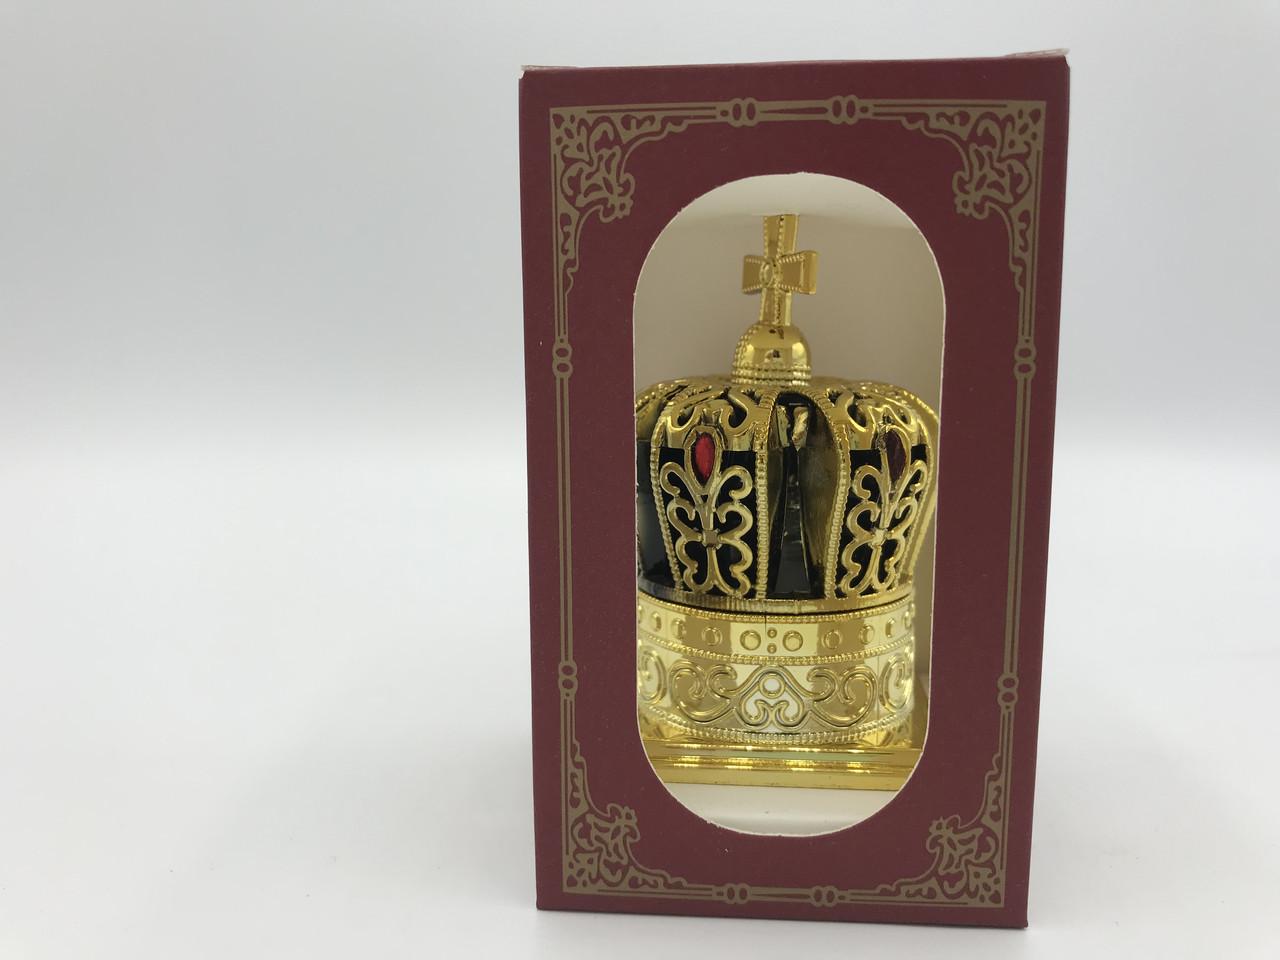 Ароматическая лампа Корона